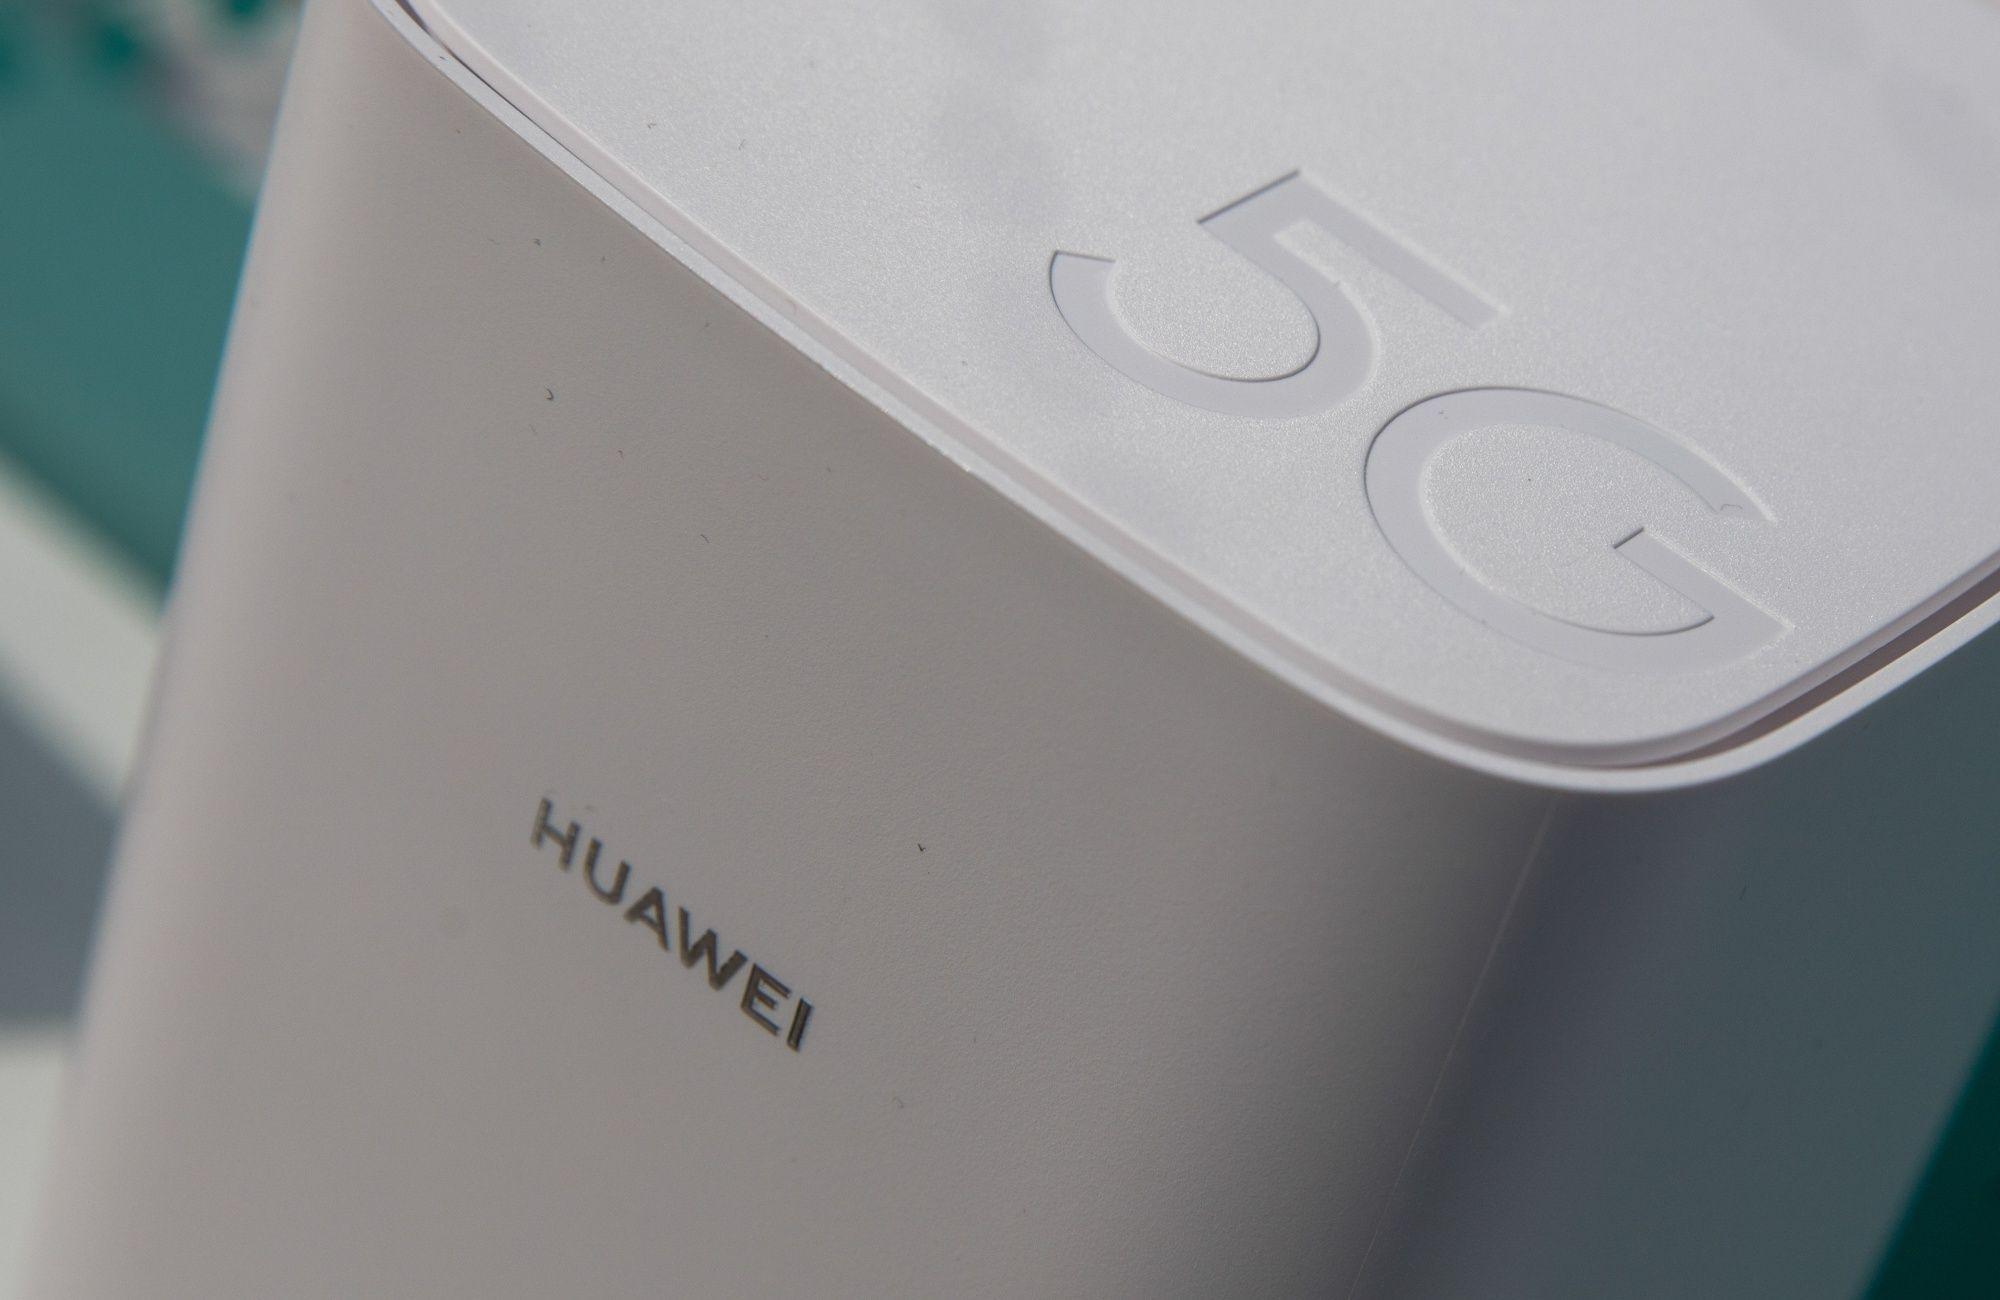 U.K. Says Huawei Decision Won't Affect U.S. Intelligence Sharing